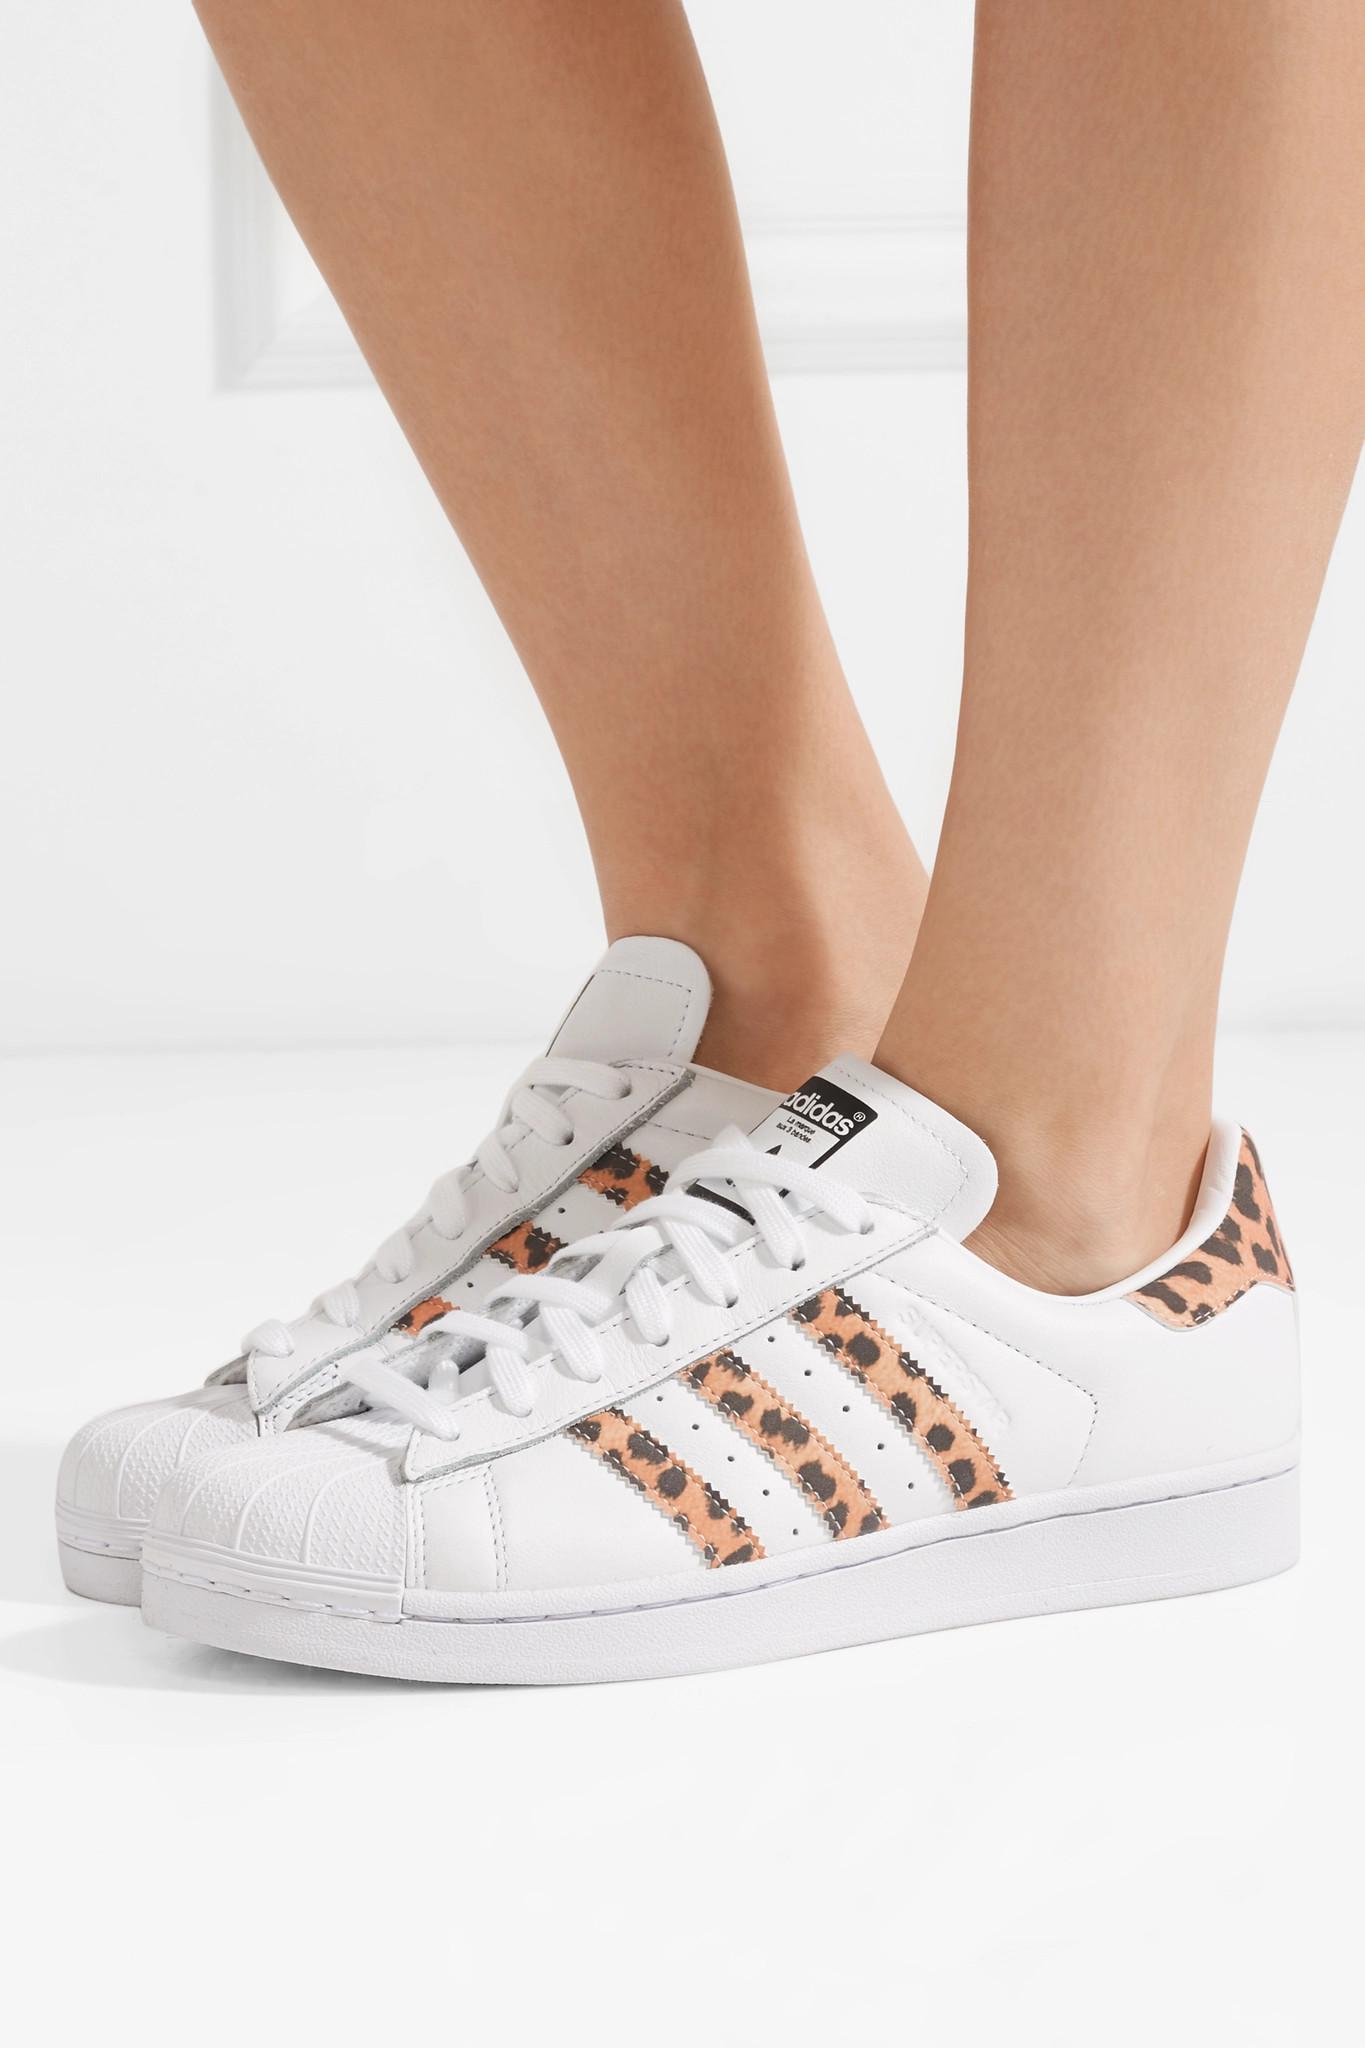 Lyst - adidas Originals Superstar Leopard Print-trimmed Leather ... f95356792